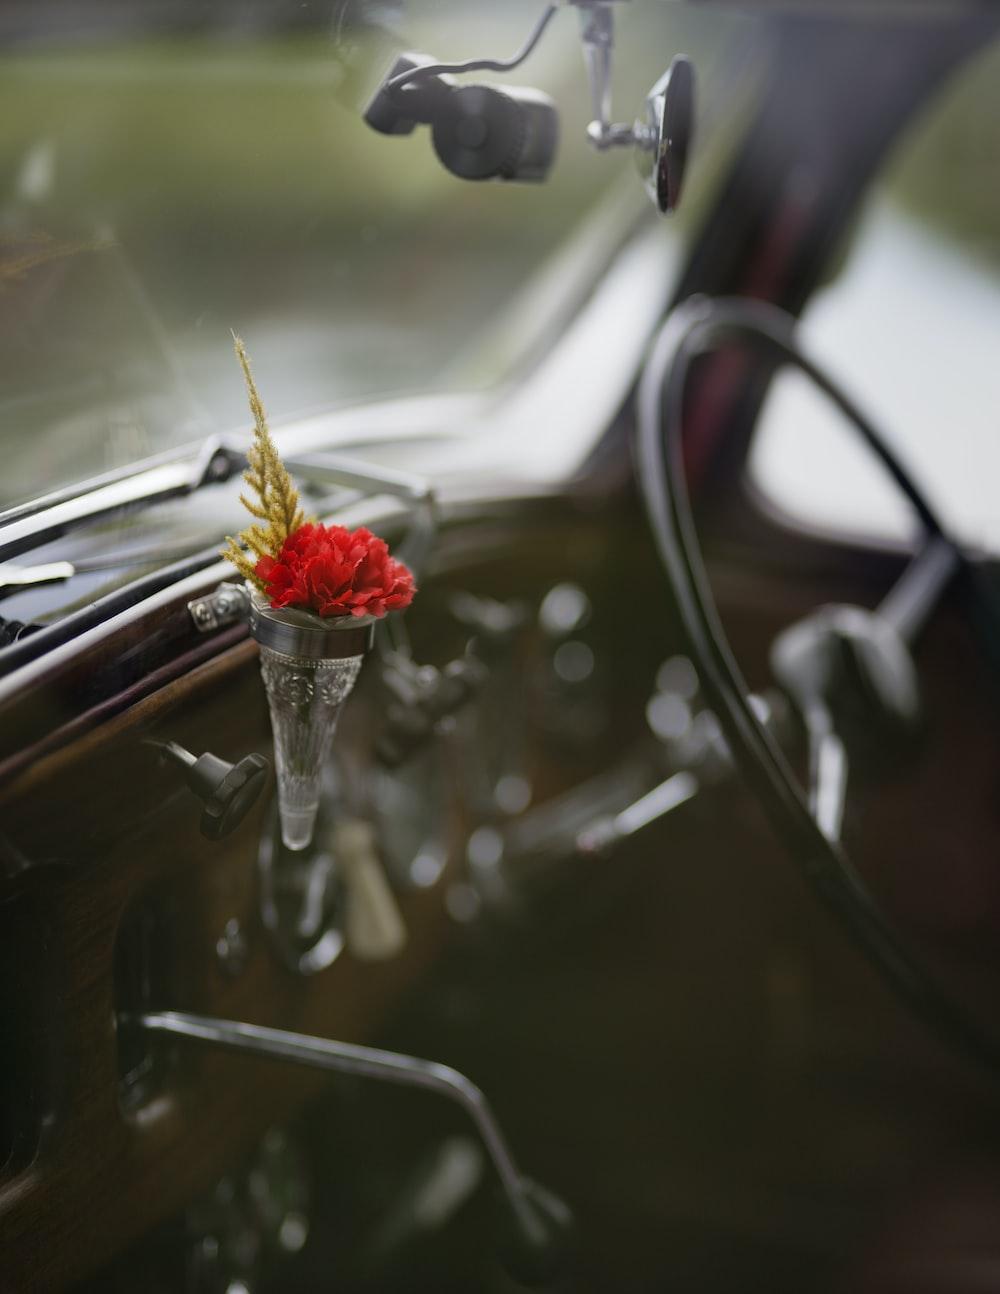 focus photo of flower inside vehicle